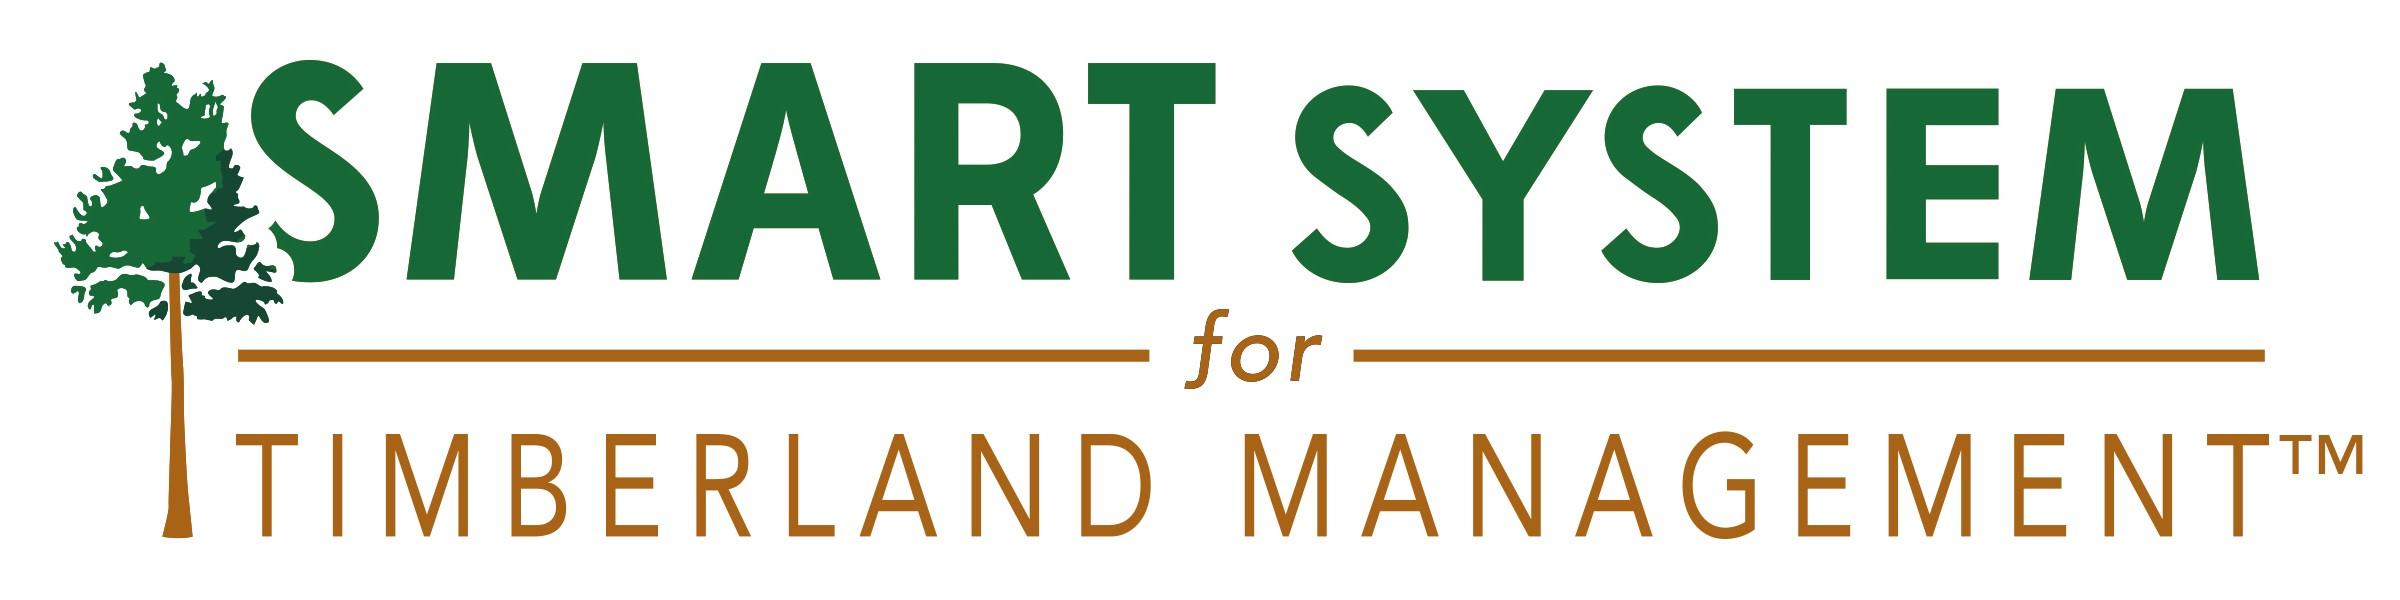 SMART System logo final